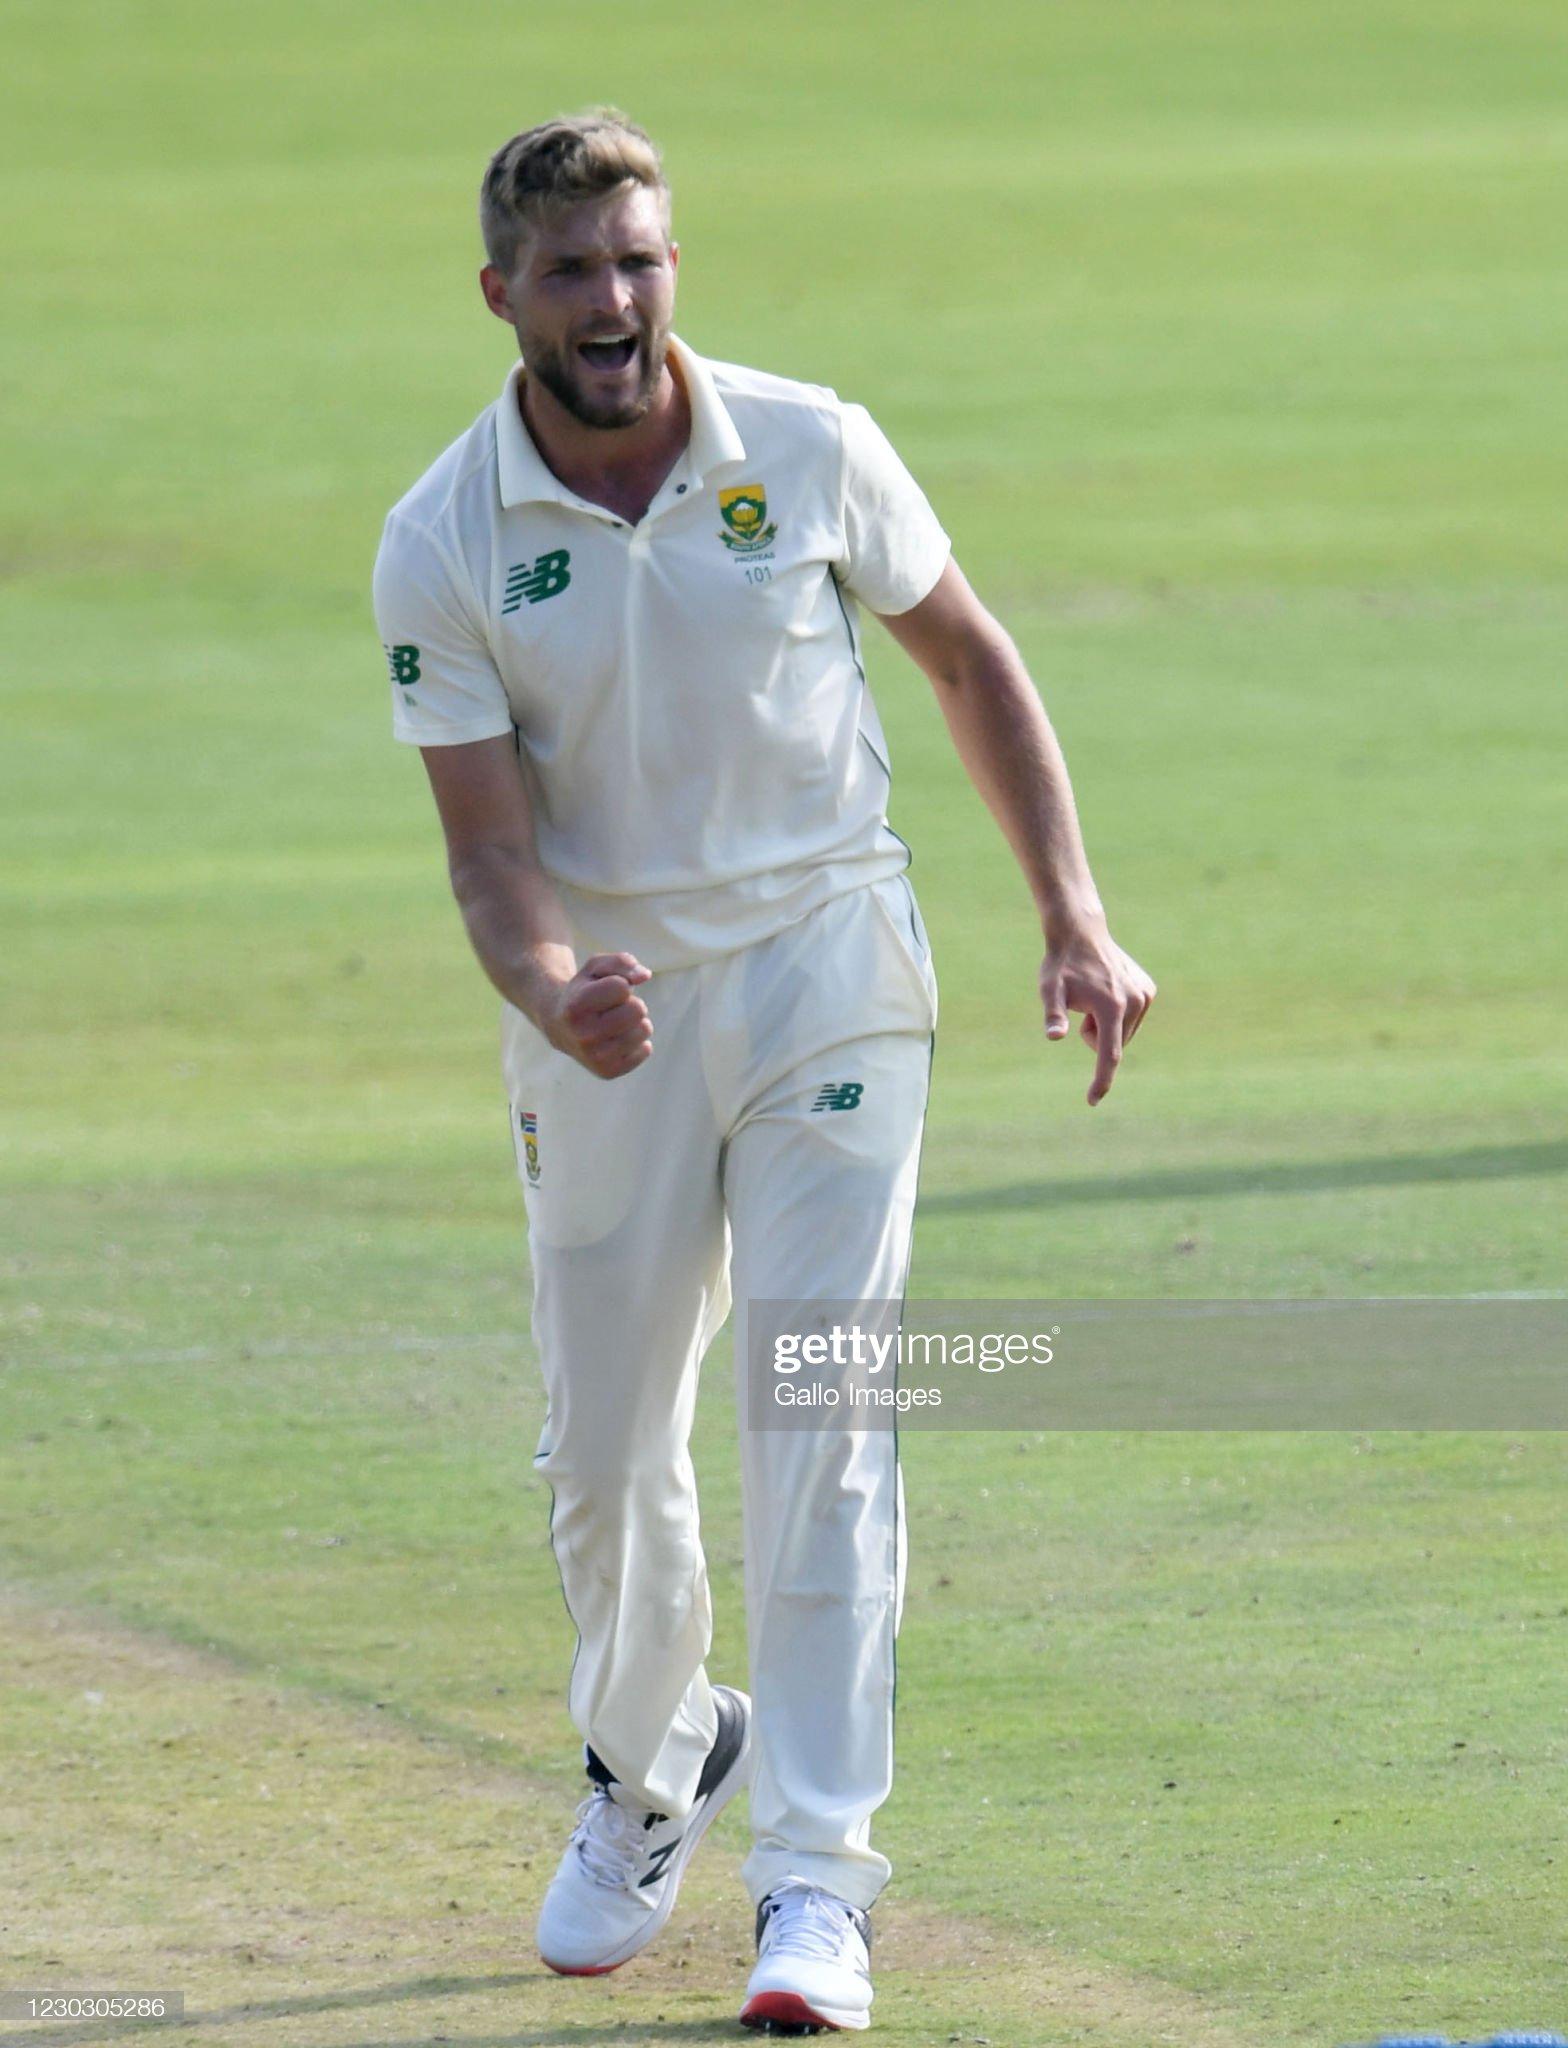 South Africa v Sri Lanka - First Test Day 1 : News Photo